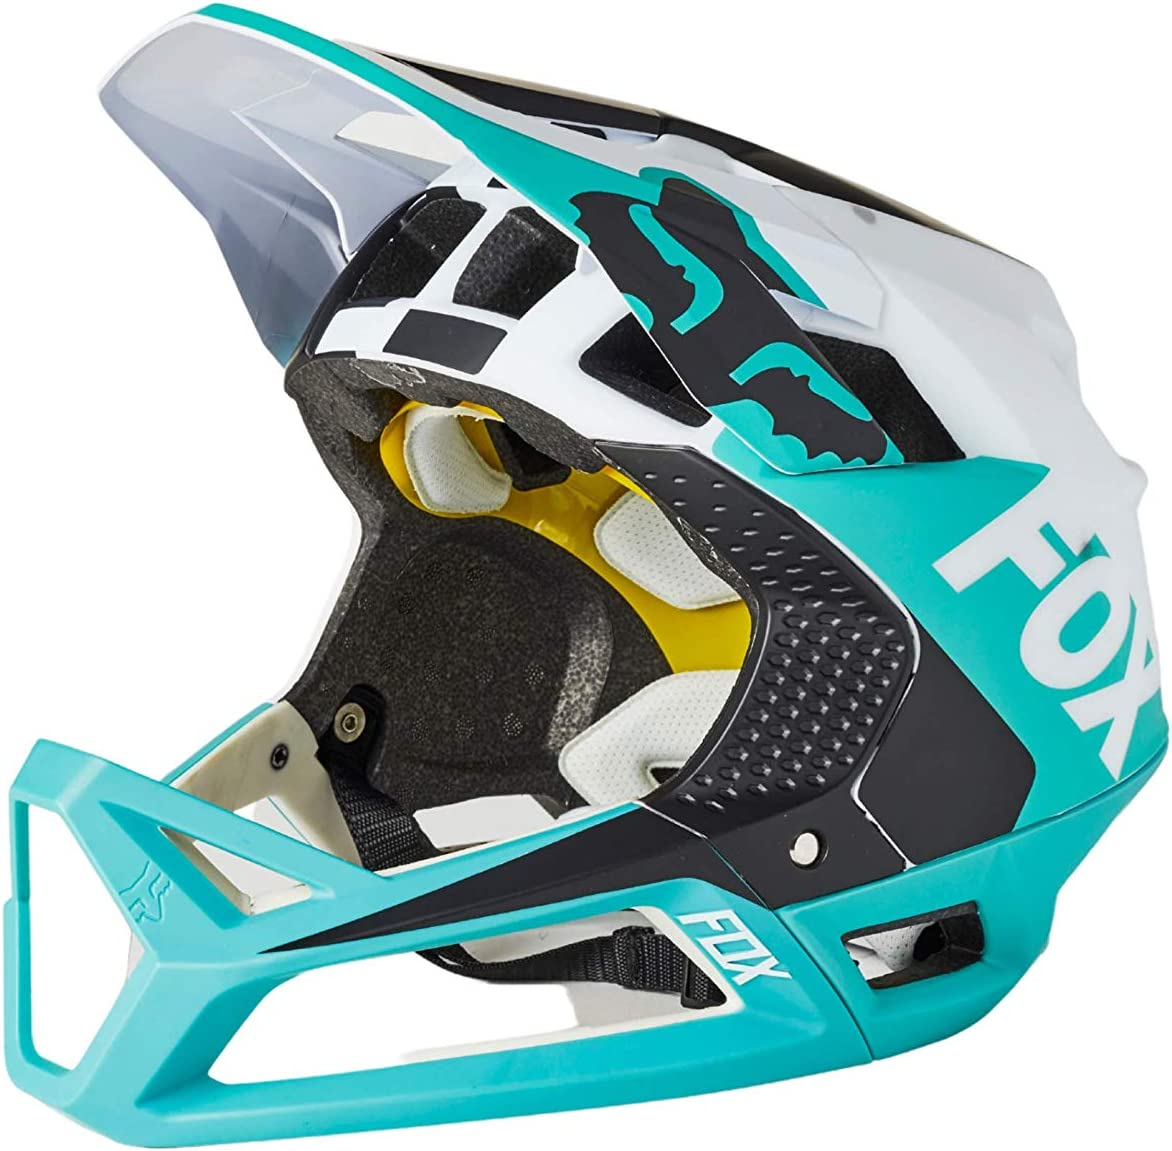 Popular product Fox Racing Max 54% OFF BMX-Bike-Helmets PROFRAME Helmet Blocked